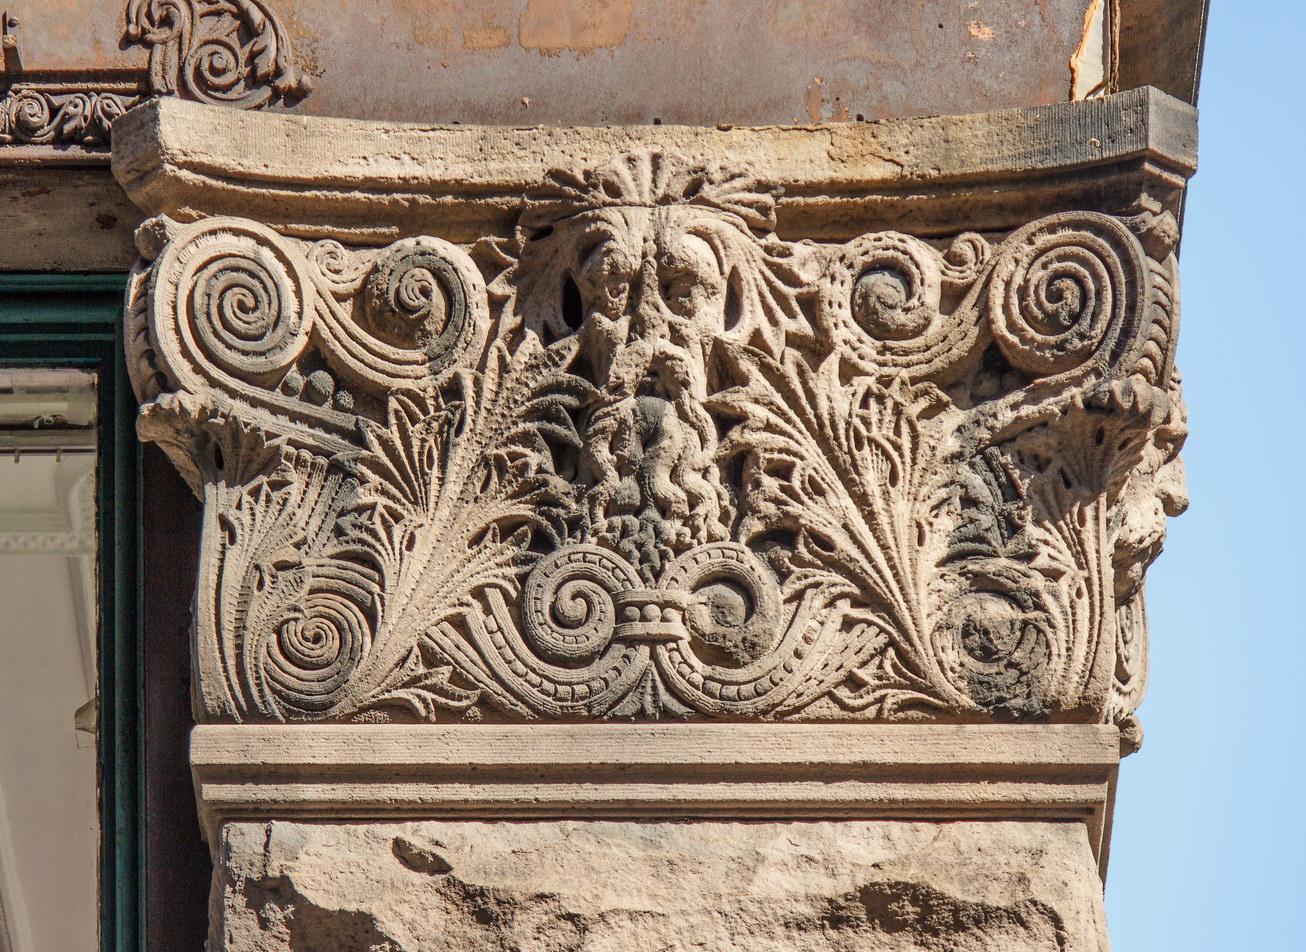 The Wilbraham - corner detail.